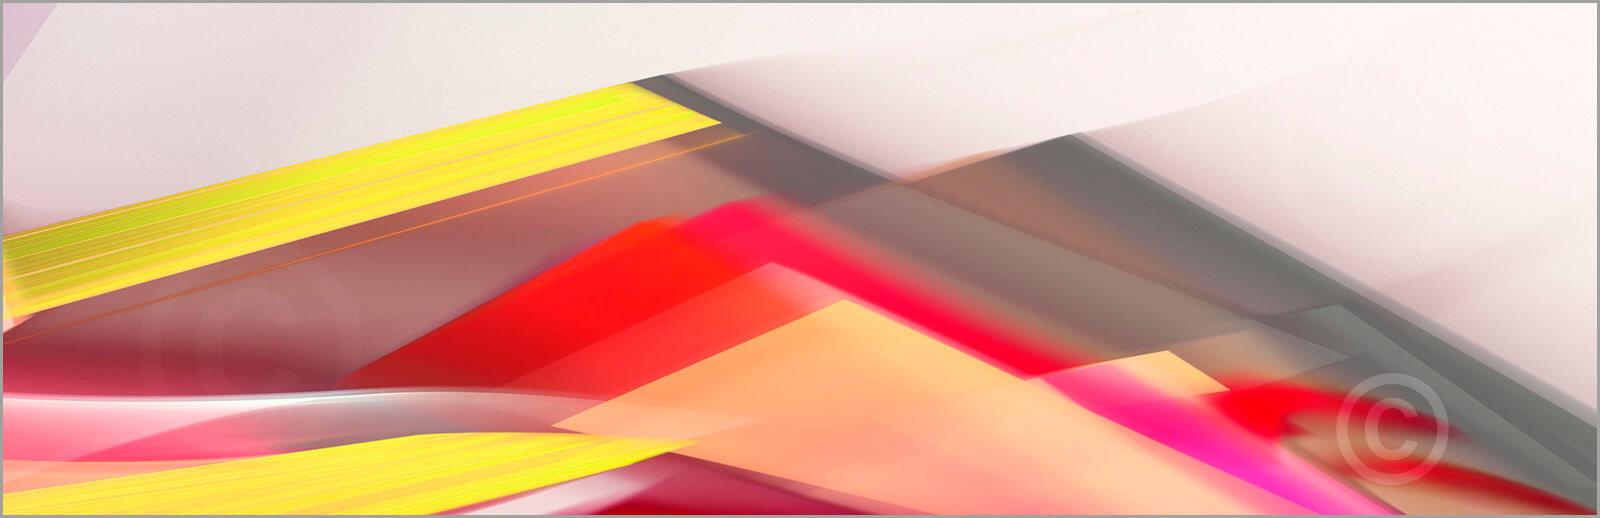 Colorshapes_F2_9857_XL